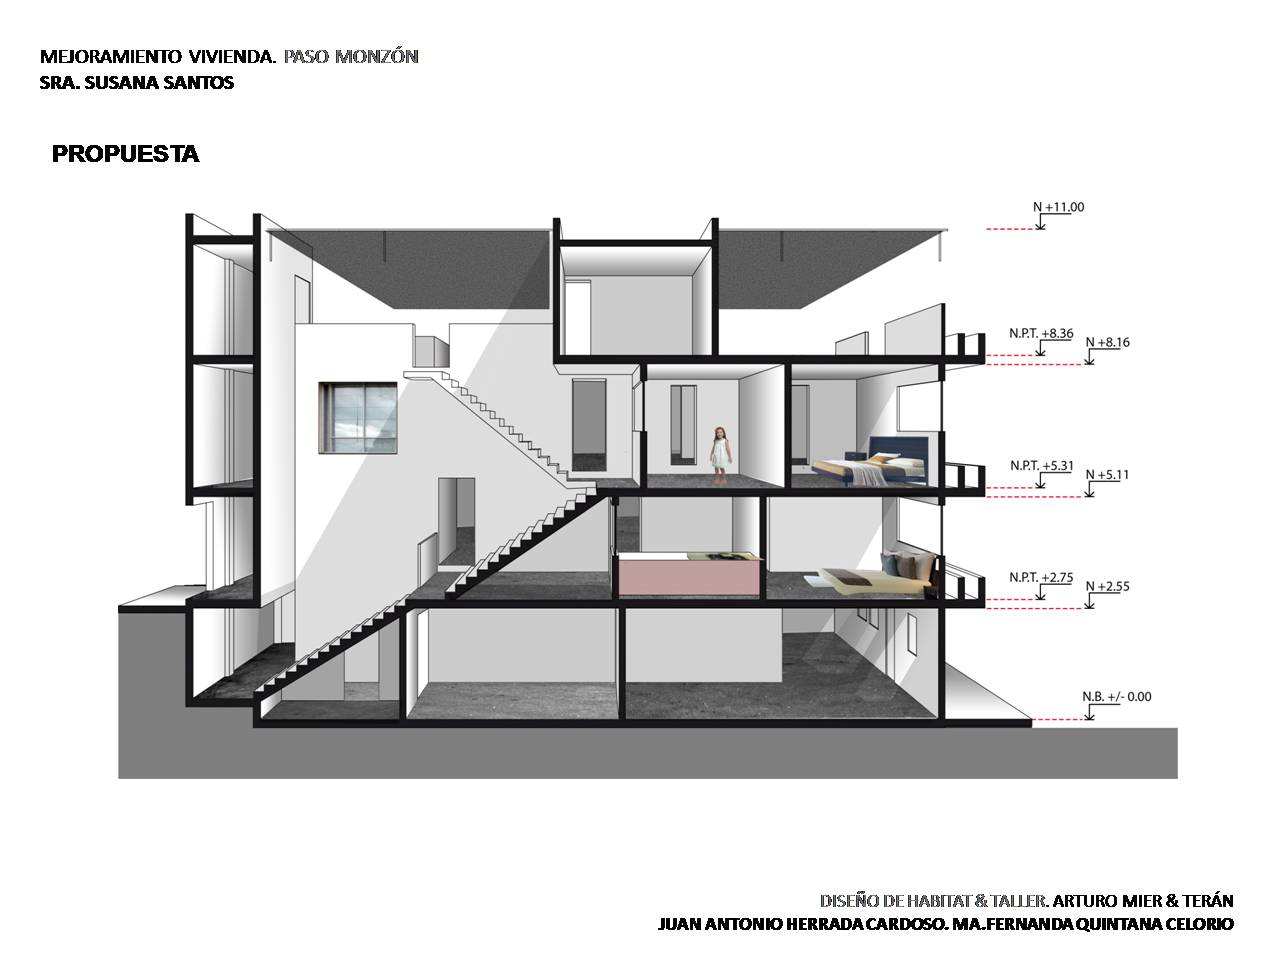 Proyecto portafolio arquitectura en red for Portafolio arquitectura